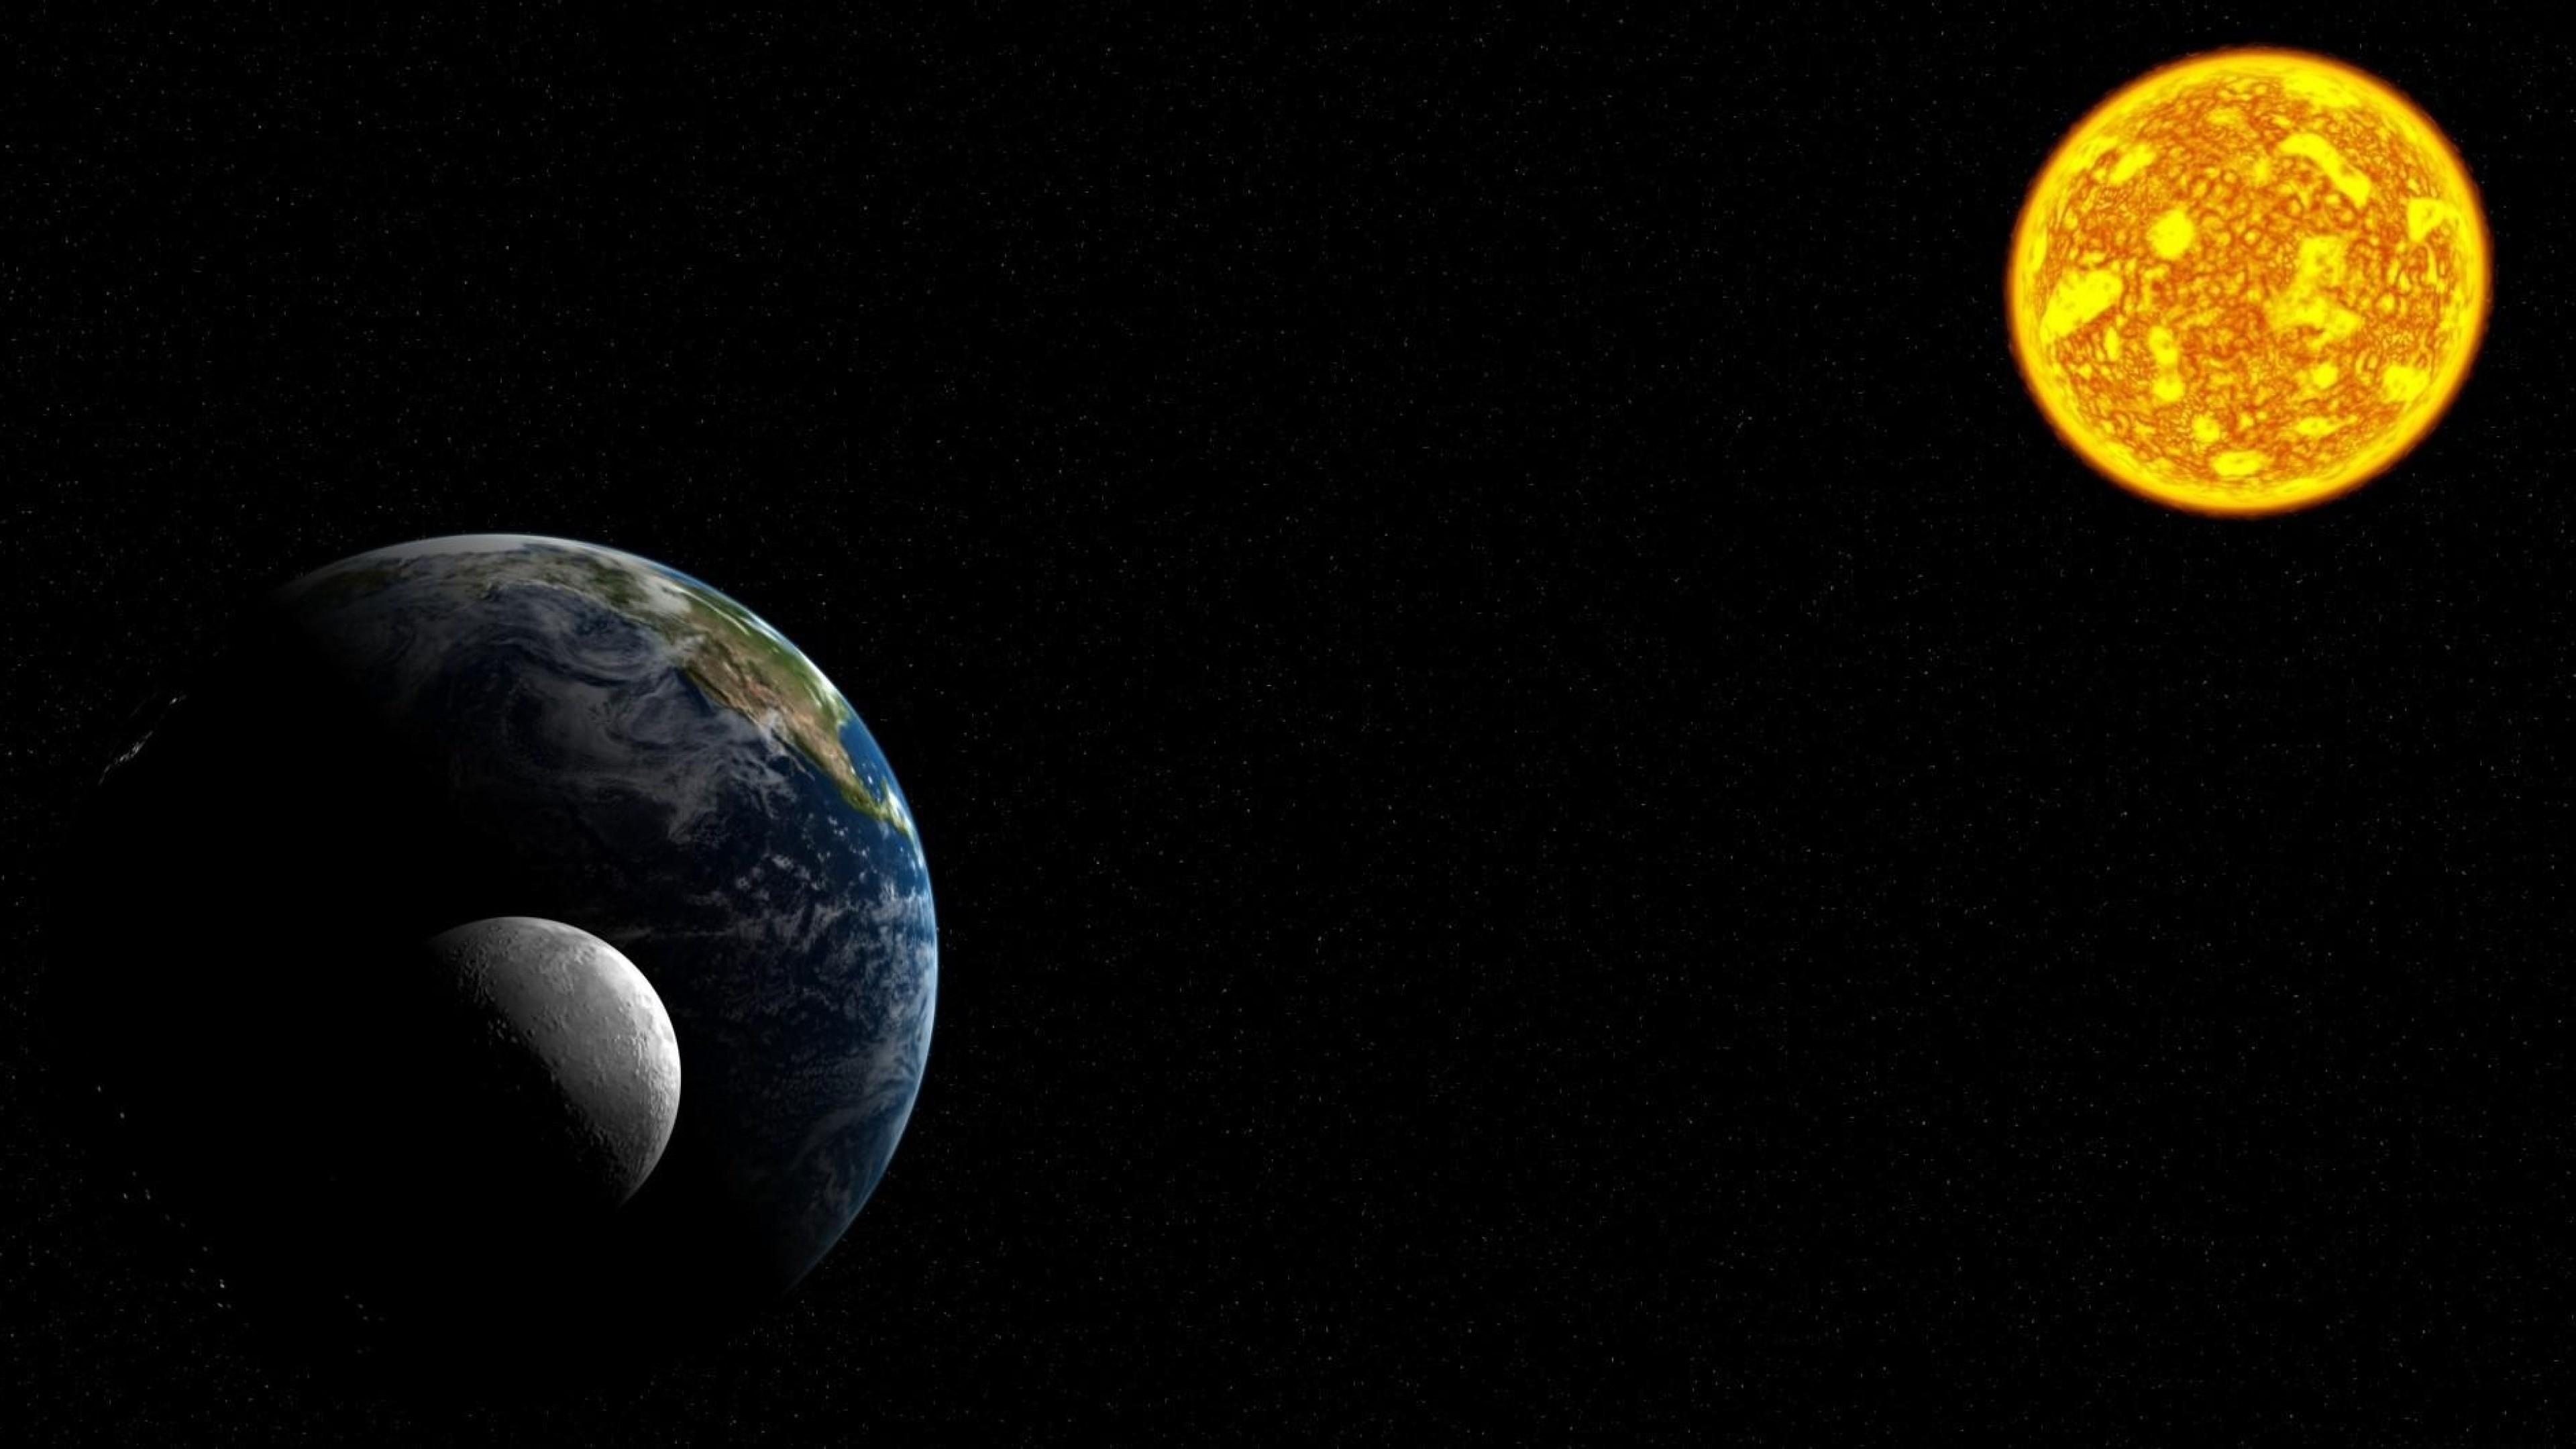 earth like moon - HD1920×1060